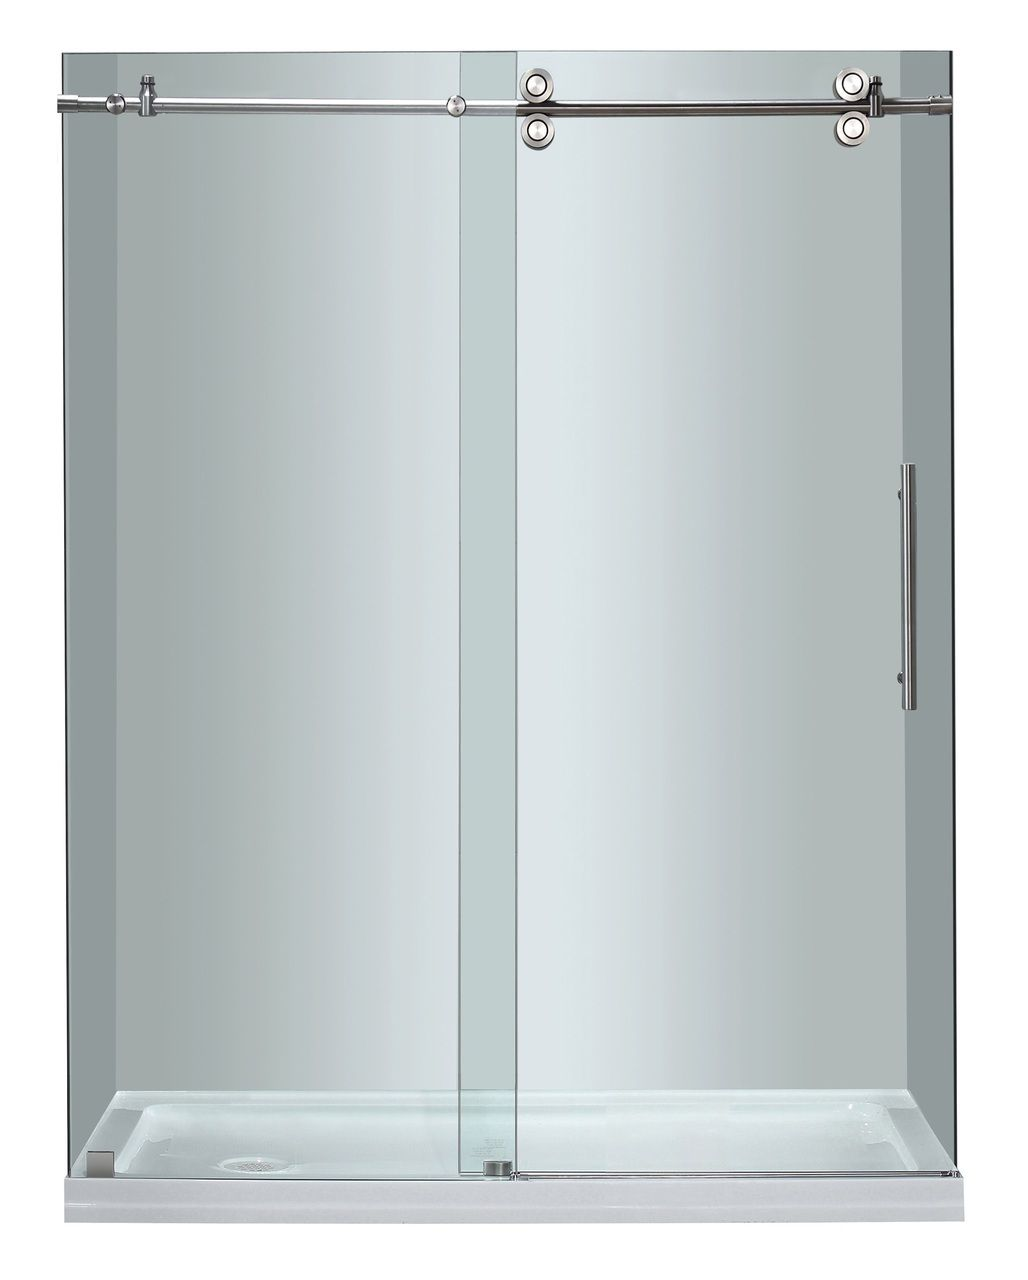 Sdr978 Langham Completely Frameless Sliding Alcove Shower Door With Images Sliding Shower Door Shower Doors Frameless Sliding Shower Doors